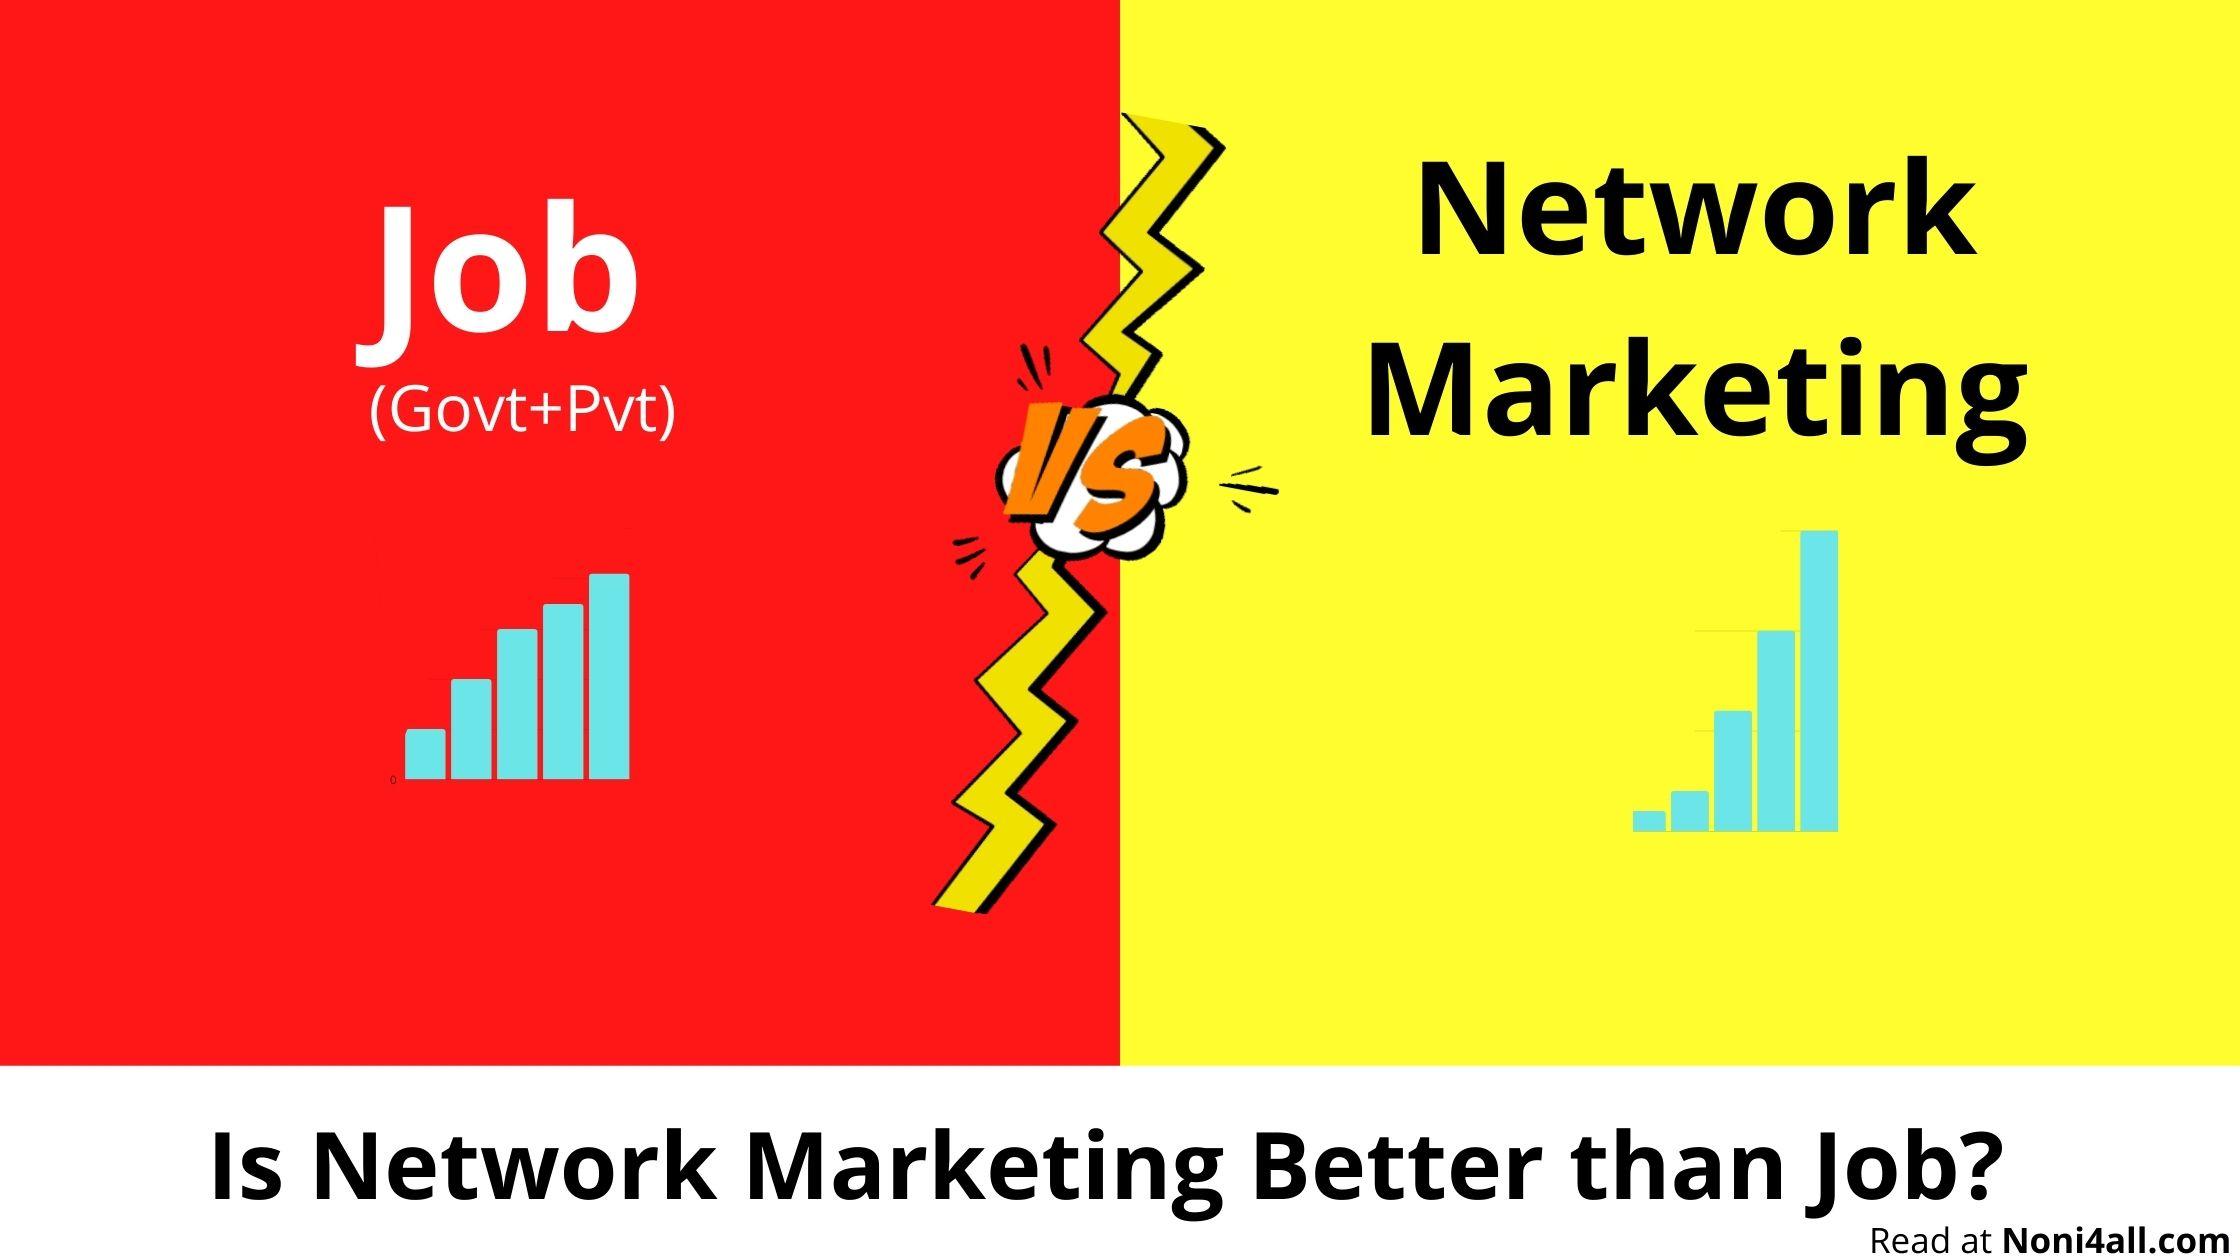 Job vs Network Marketing